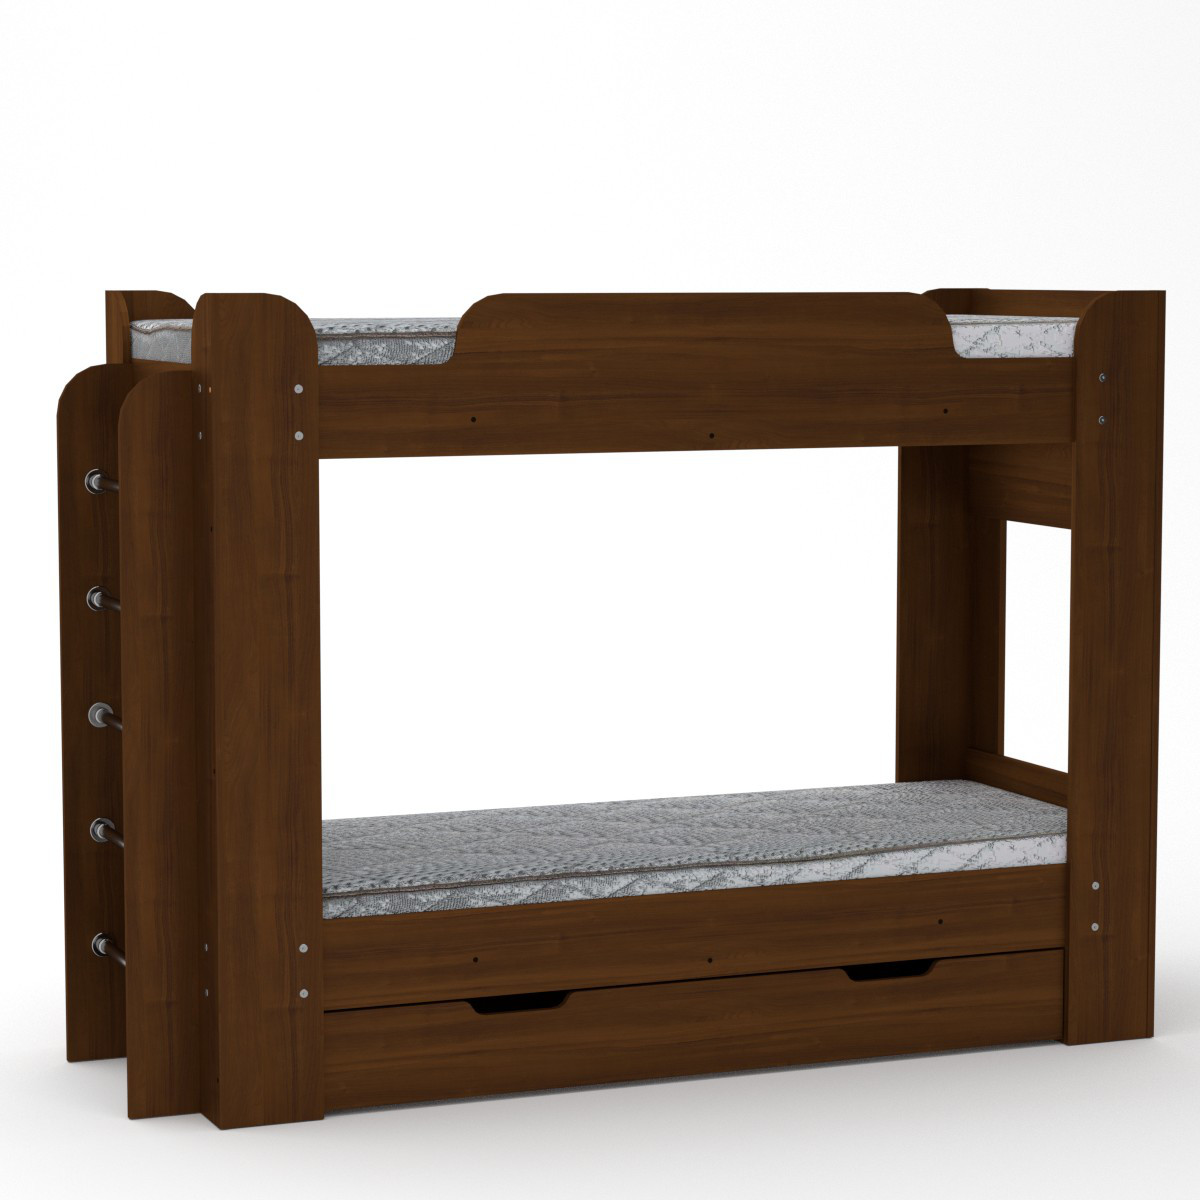 Двухъярусная кровать Твикс Компанит 1522х2108х776 мм, дсп